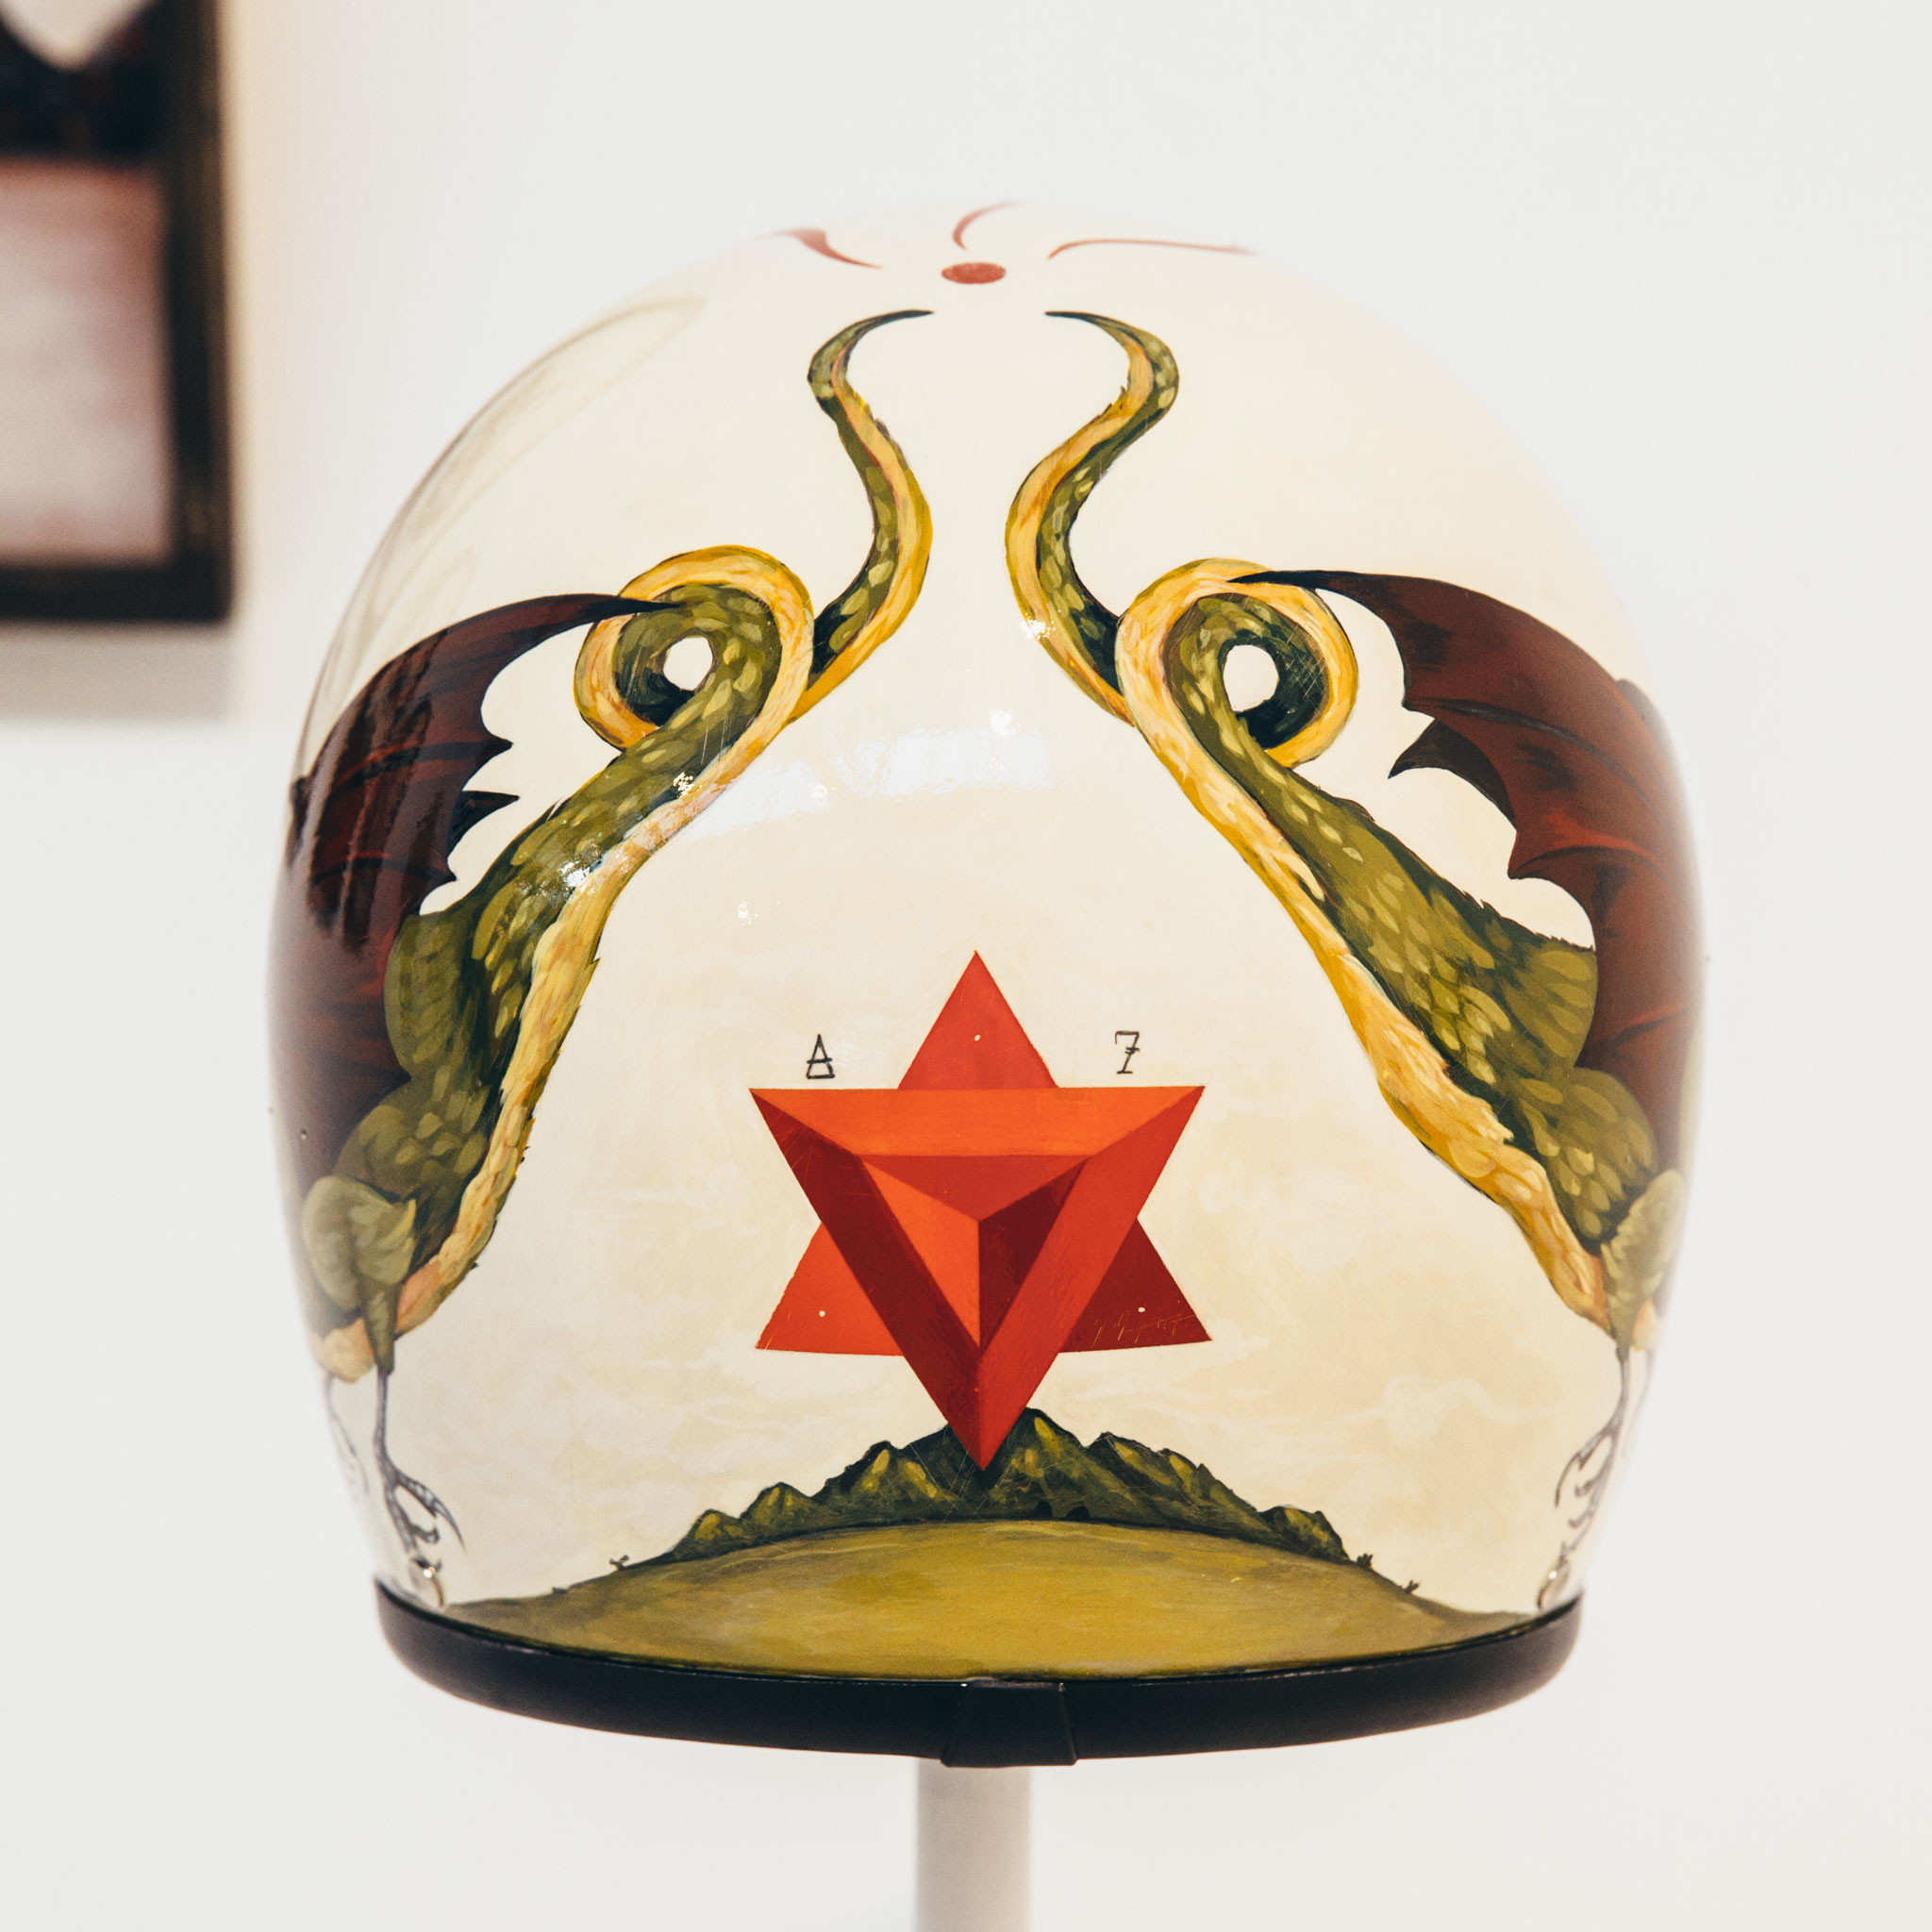 Art Pharamacy_Vandal Gallery_Sabotage MotorcyclesTwenty20_exhibition_5472.jpg